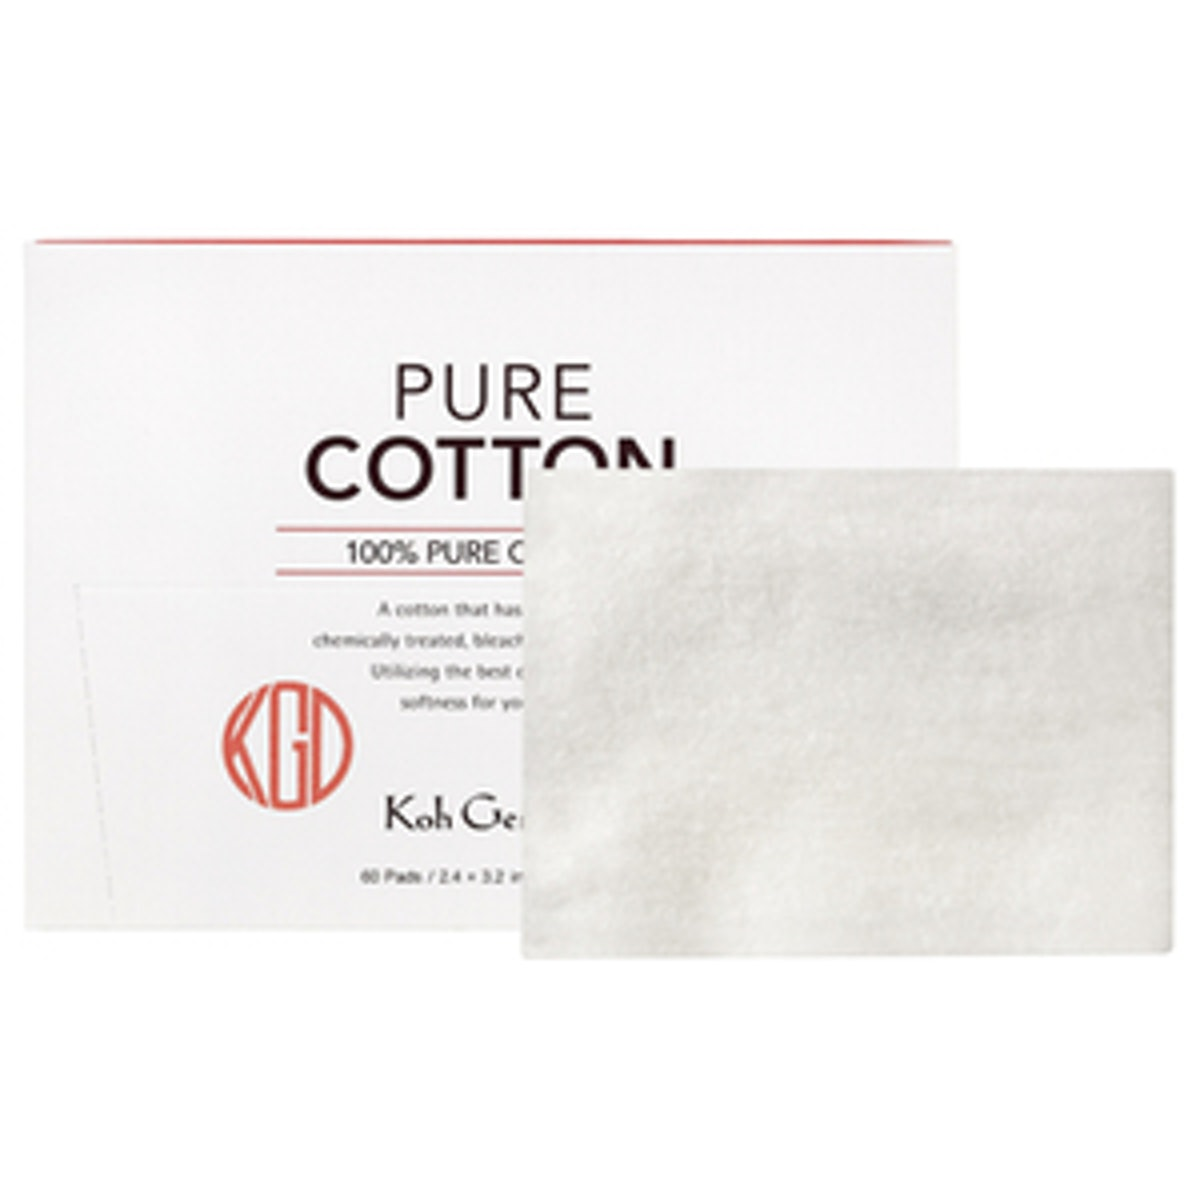 Pure Cotton Blotting Sheets